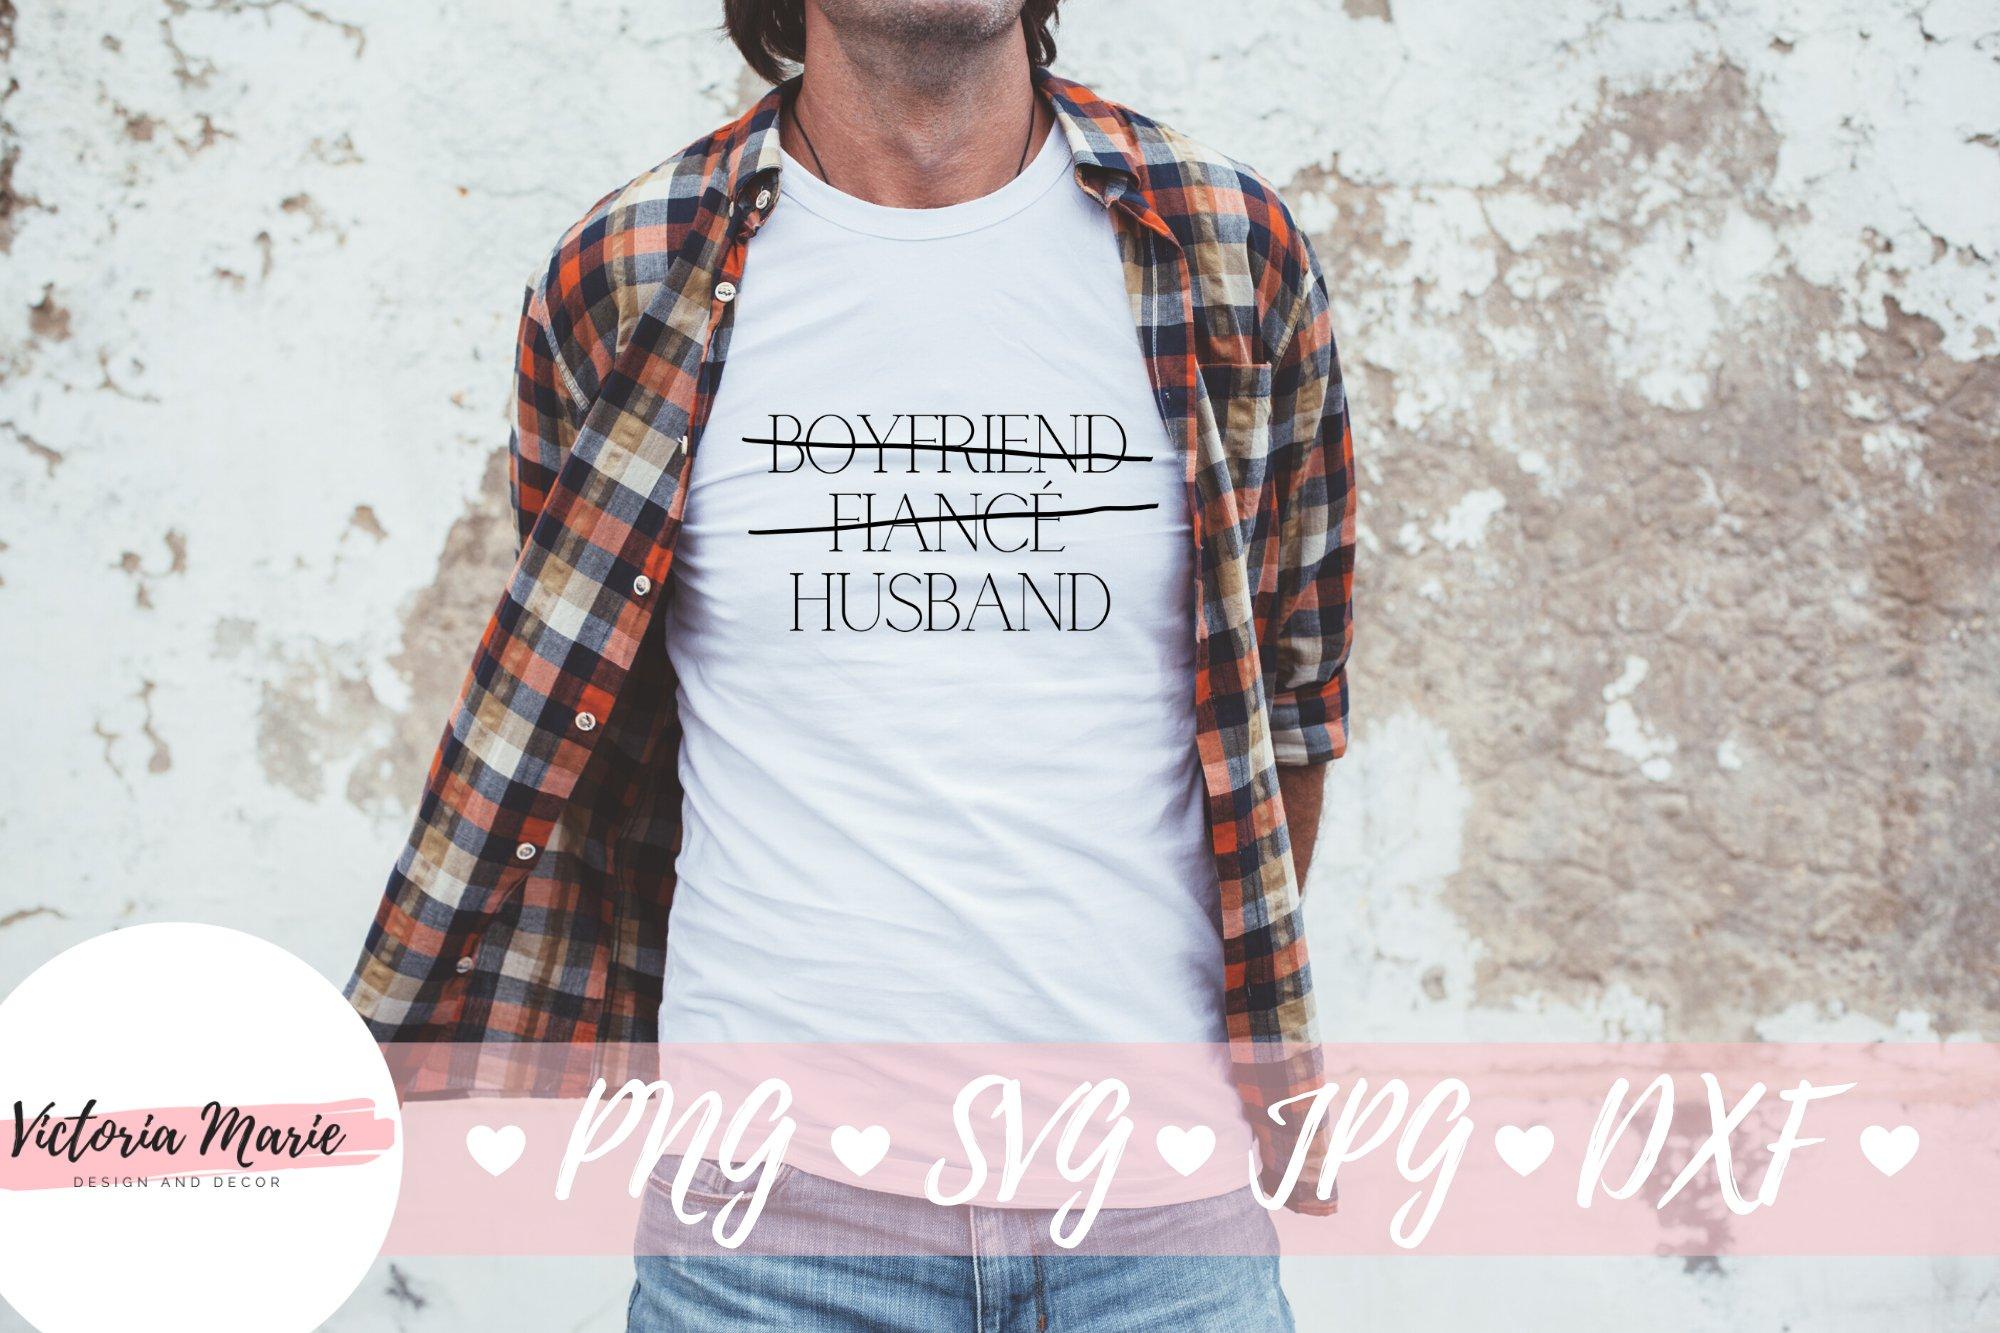 Girlfriend Fiancee Wife svg, Boyfriend Fiance Husband svg example image 5